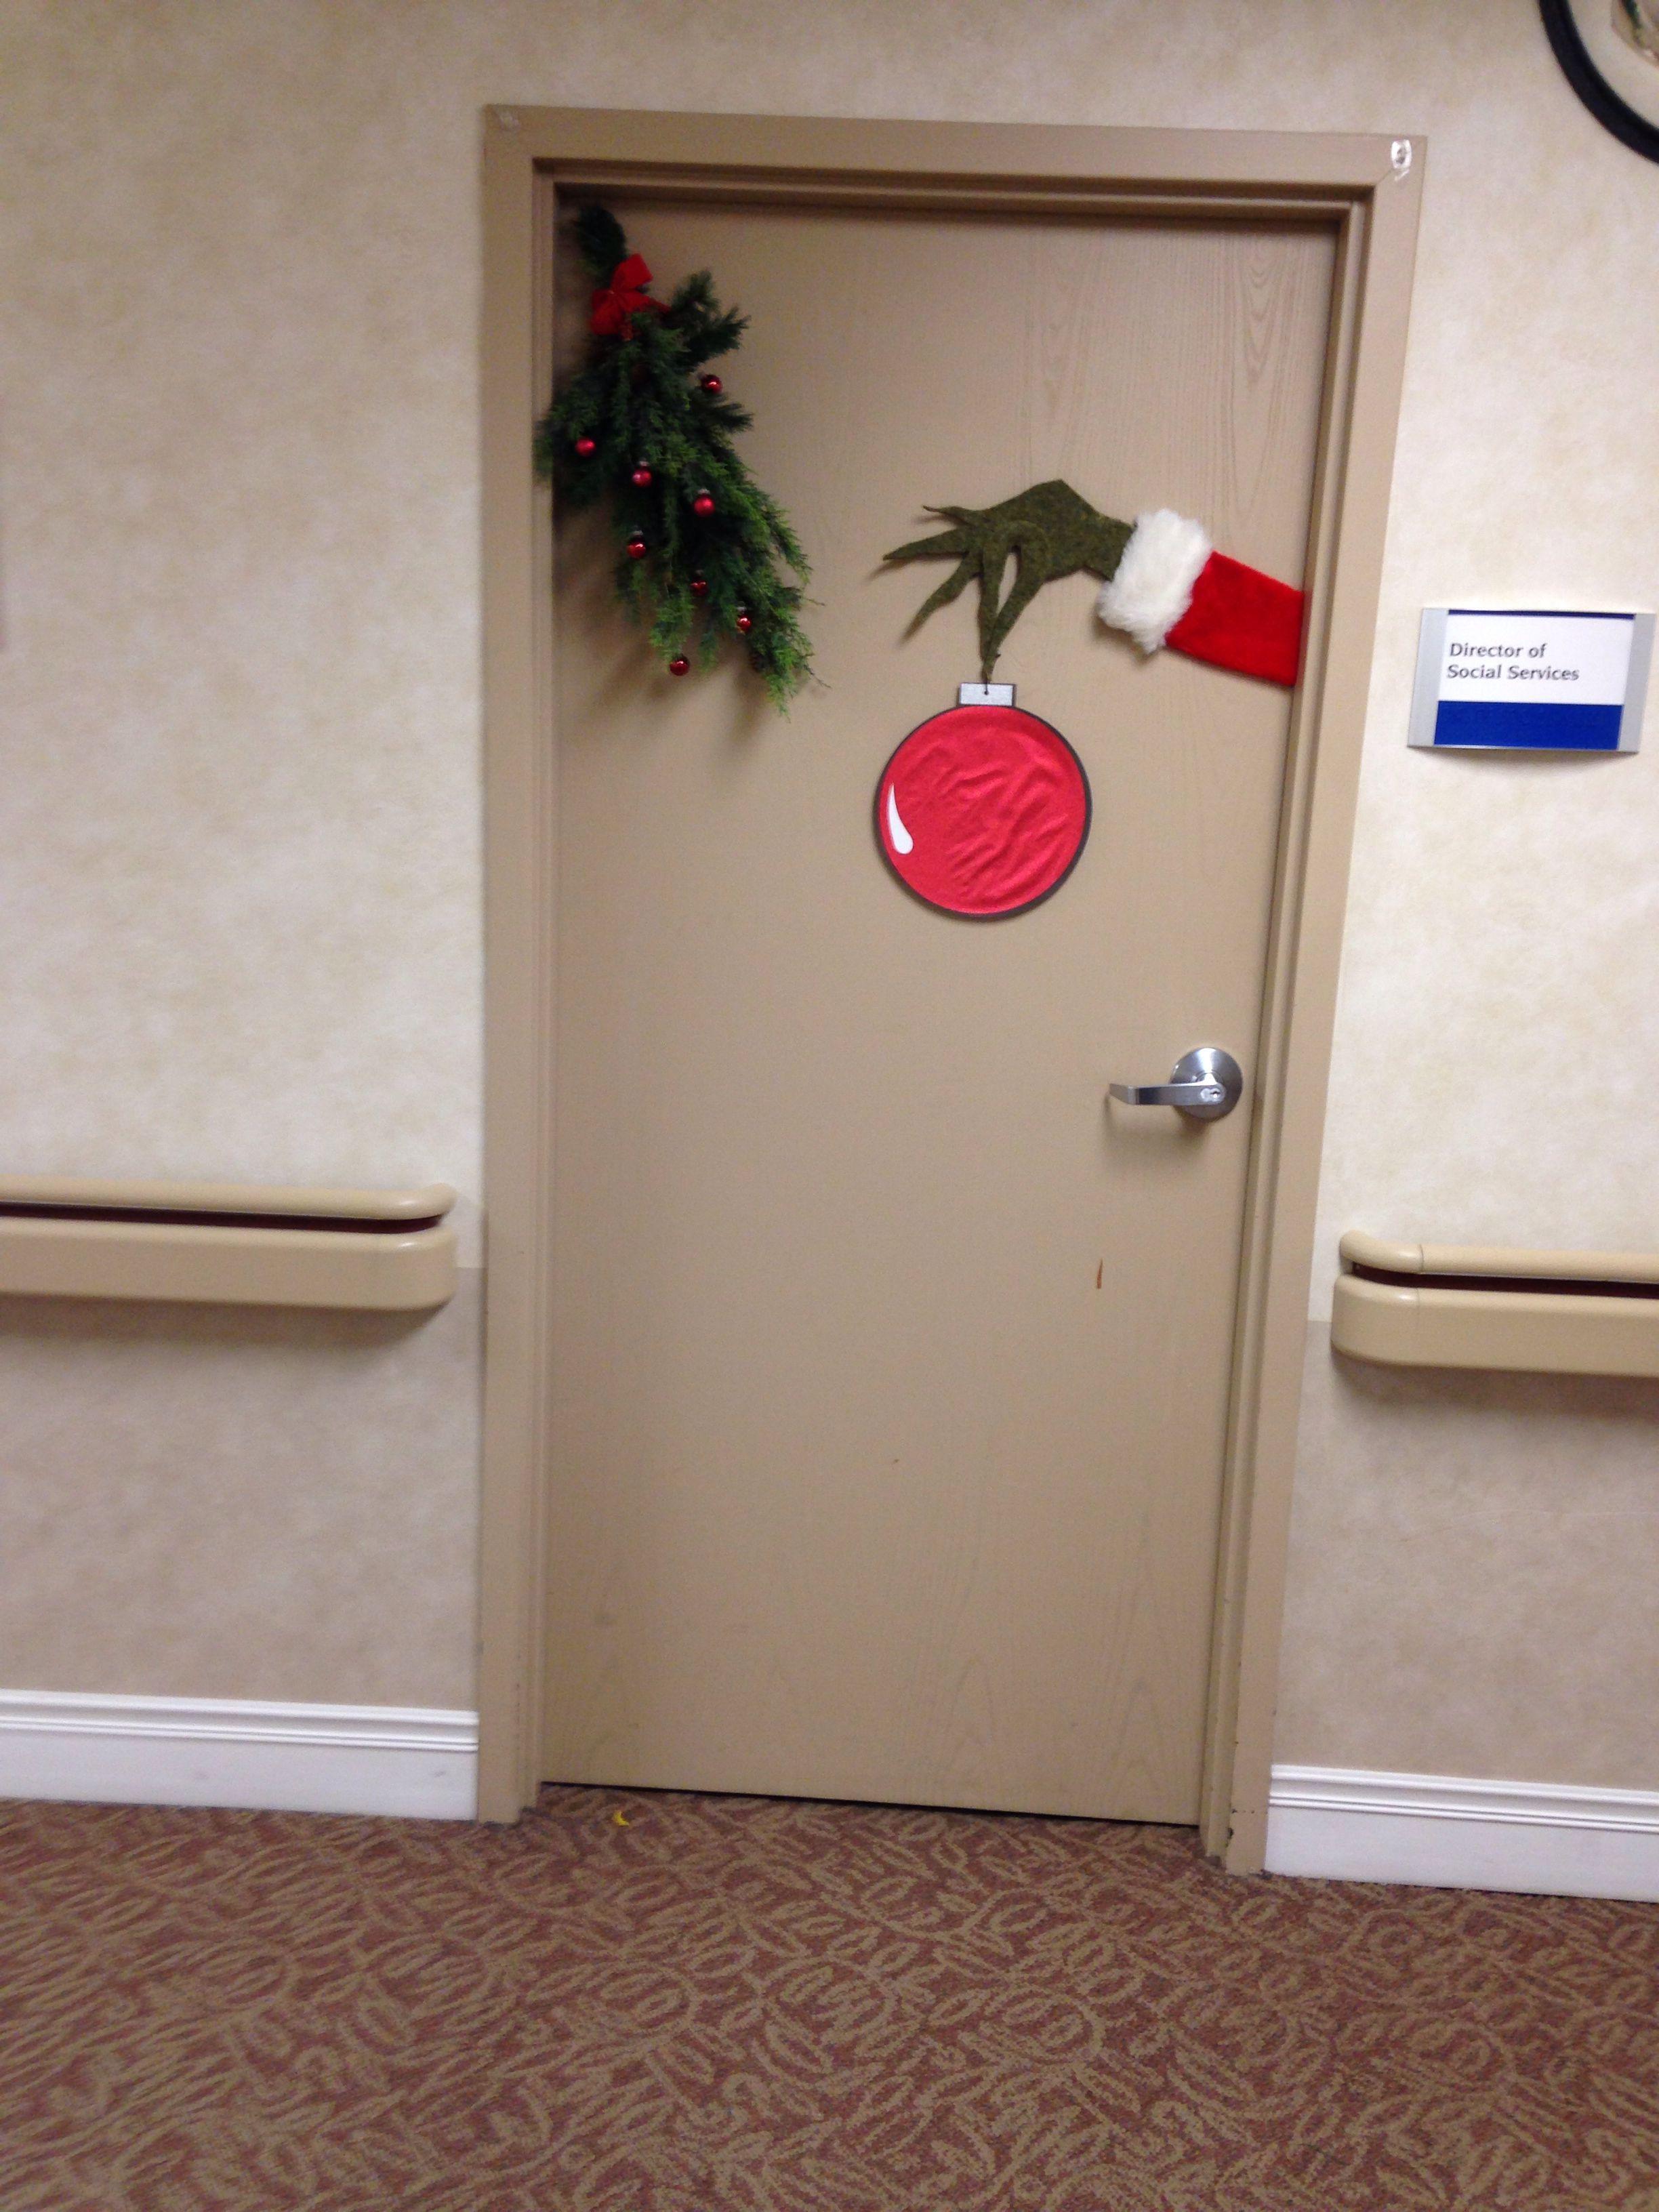 Image Result For Grinch Door Decoration Office Christmas Decorations Easy Christmas Decorations Christmas Door Decorations